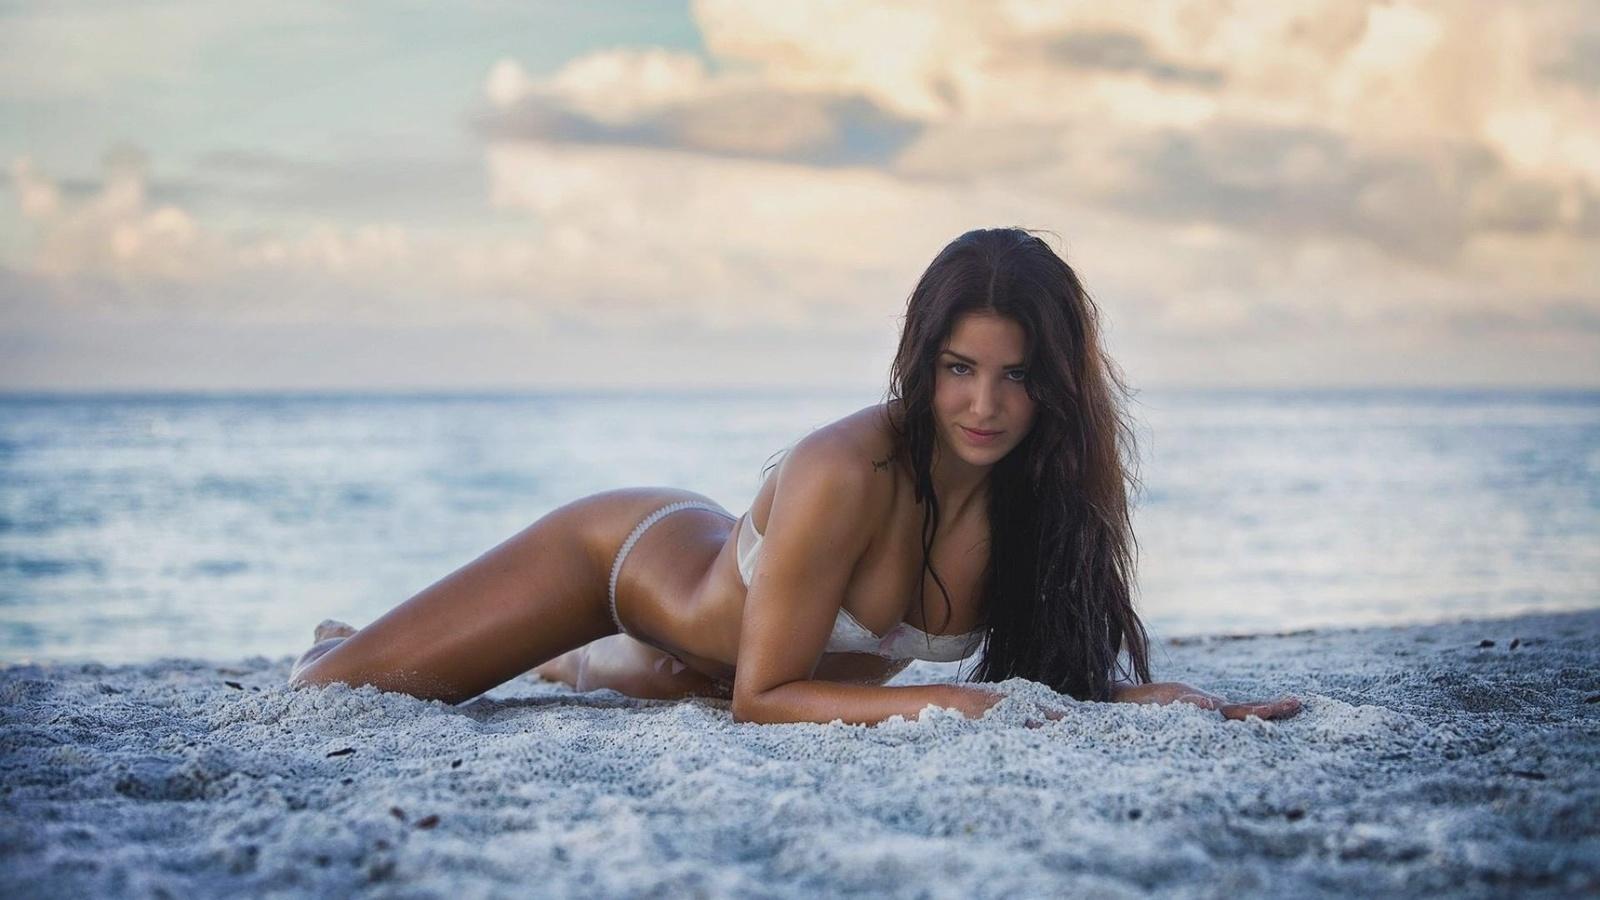 Beach latina nude smalljpg topless, nasty naked nerds